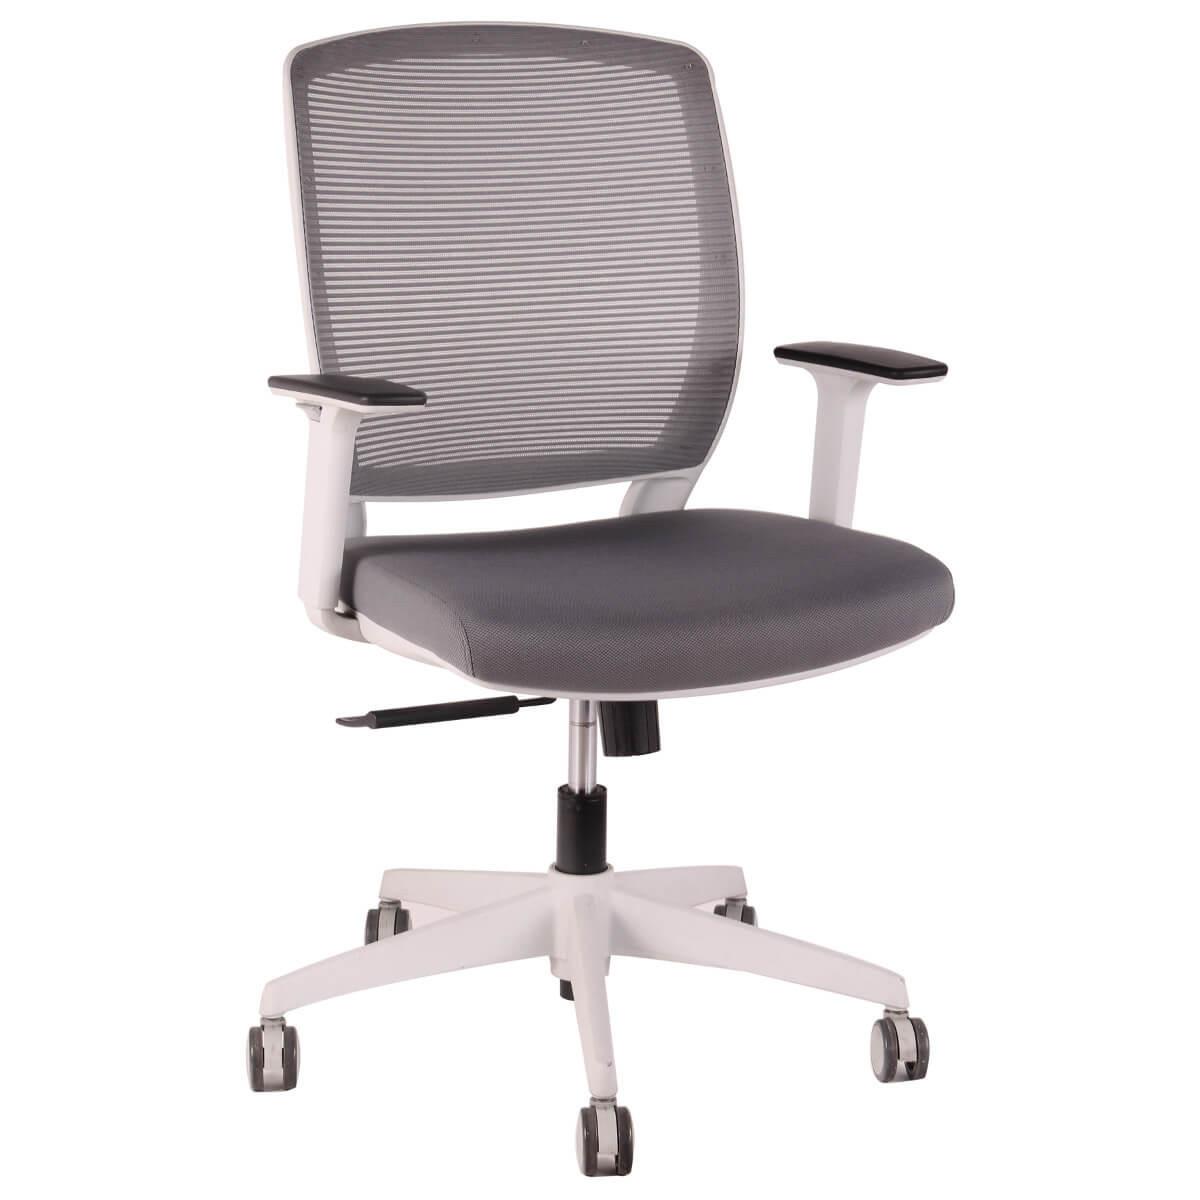 silla de escritorio respaldo en malla